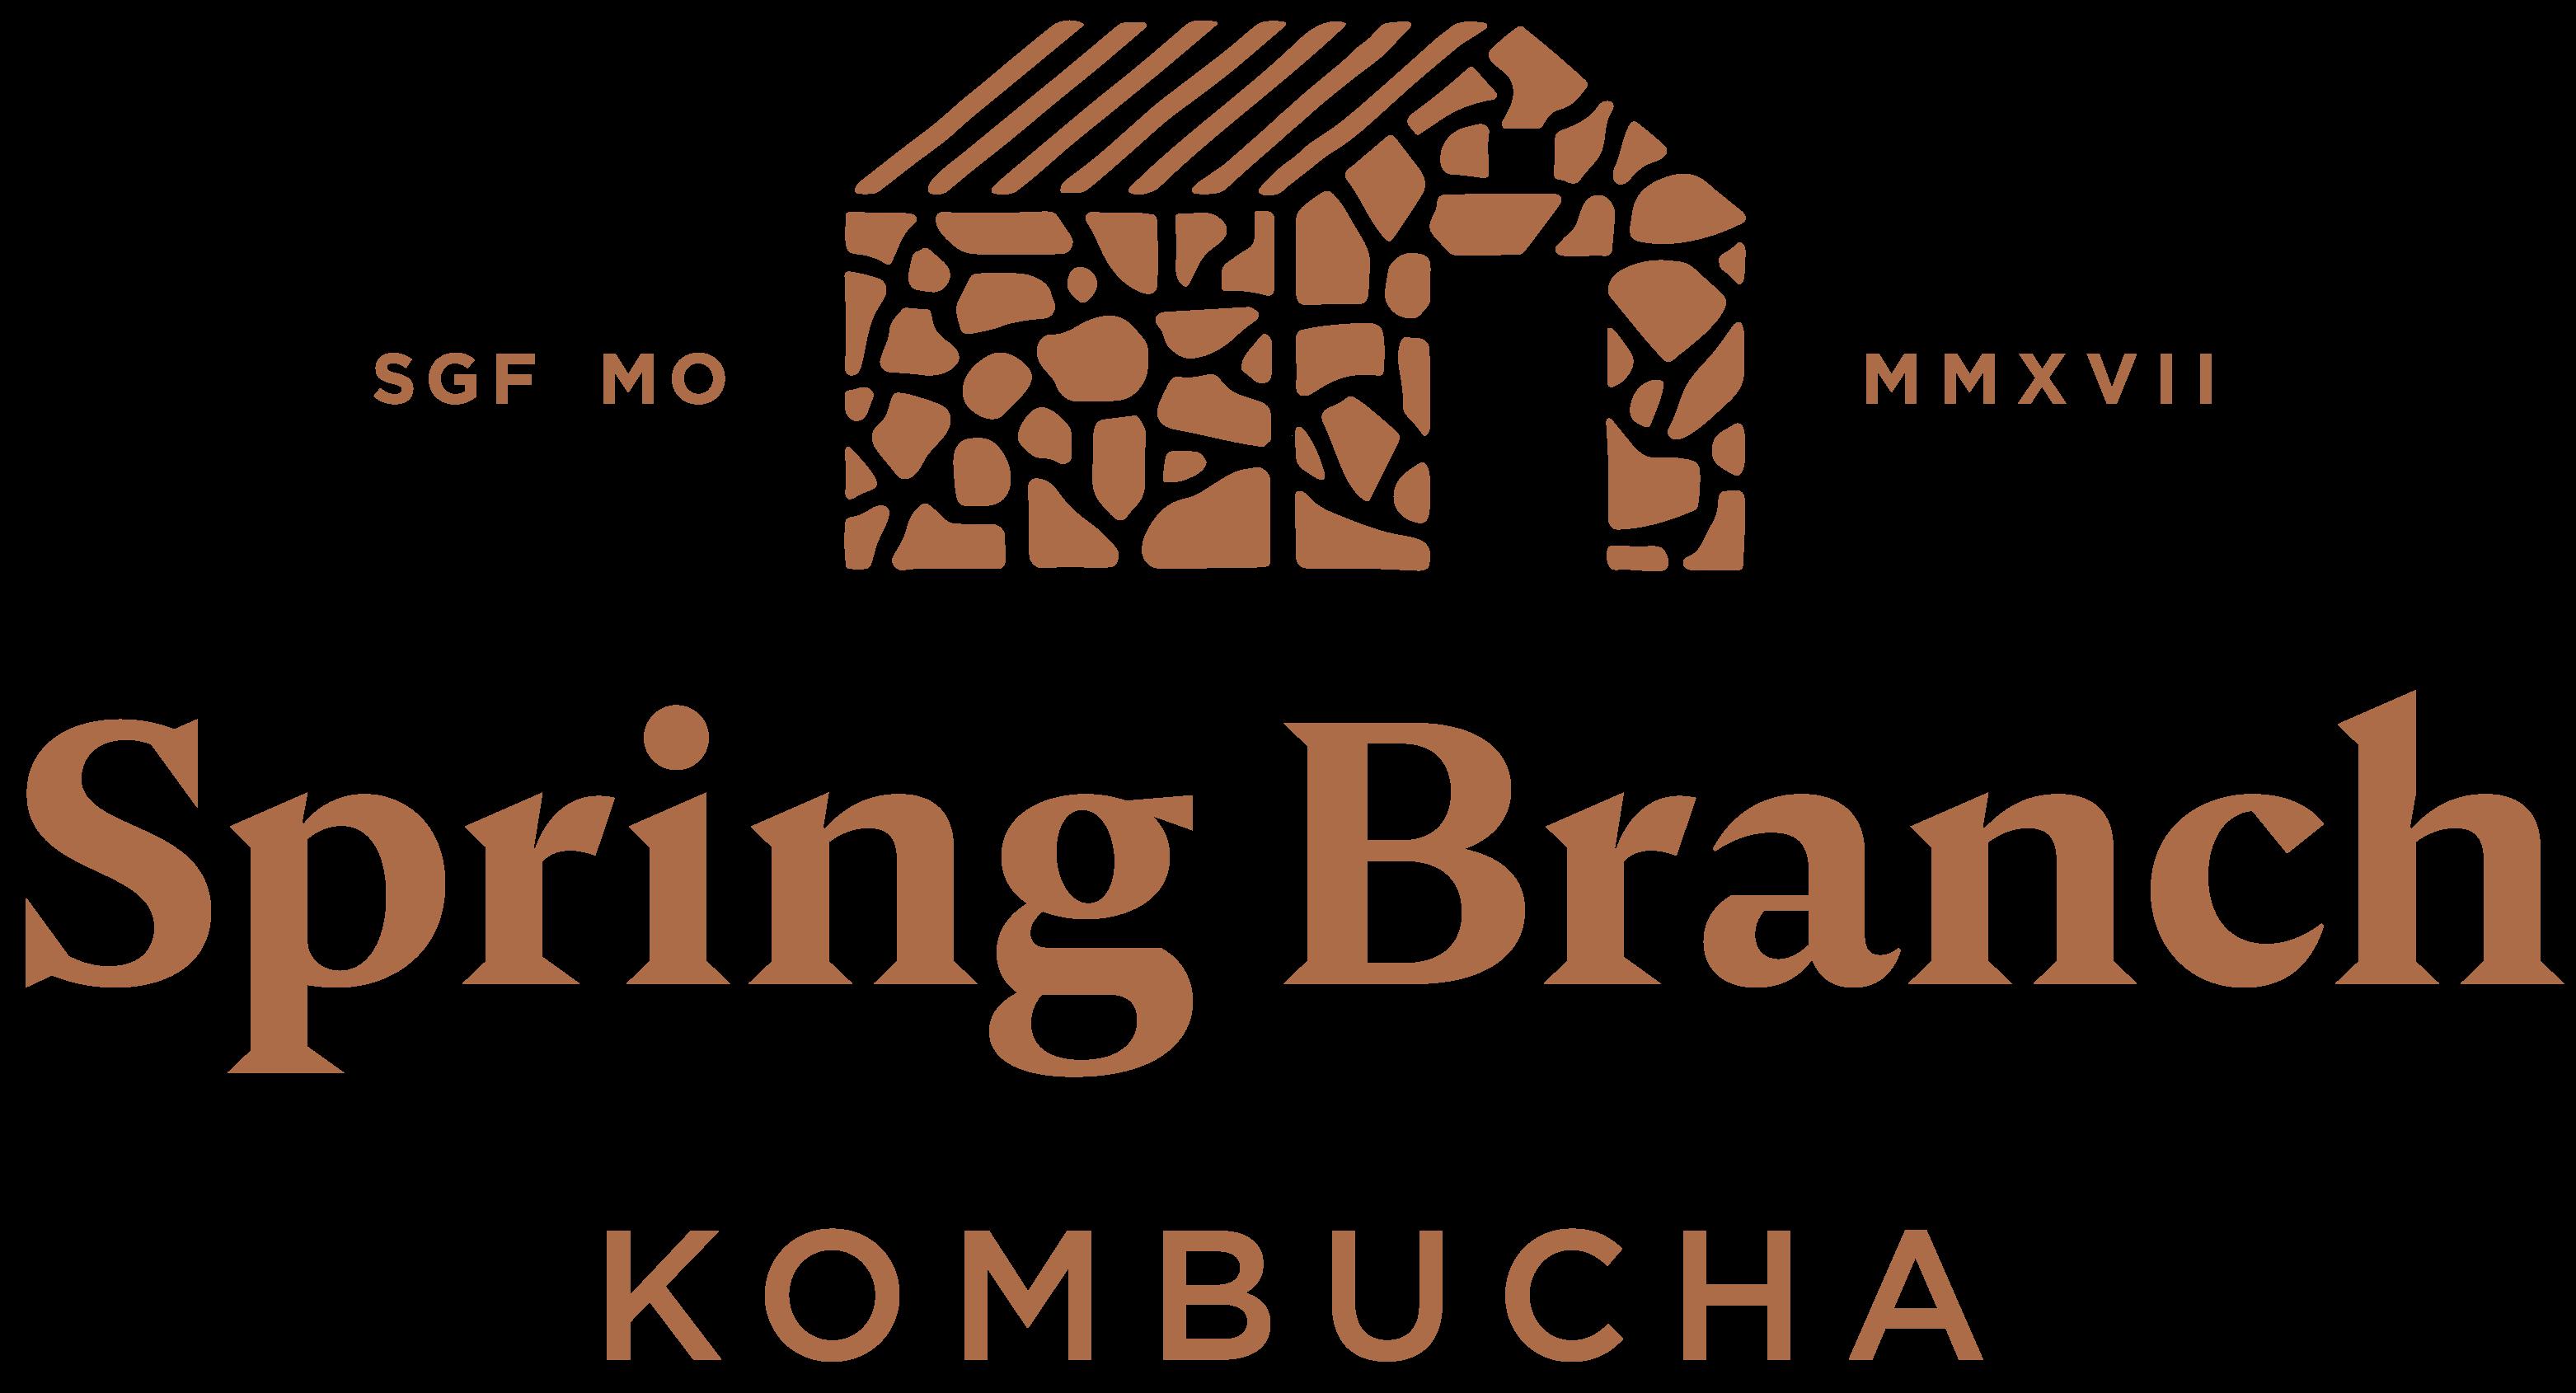 Spring Branch Kombucha logo